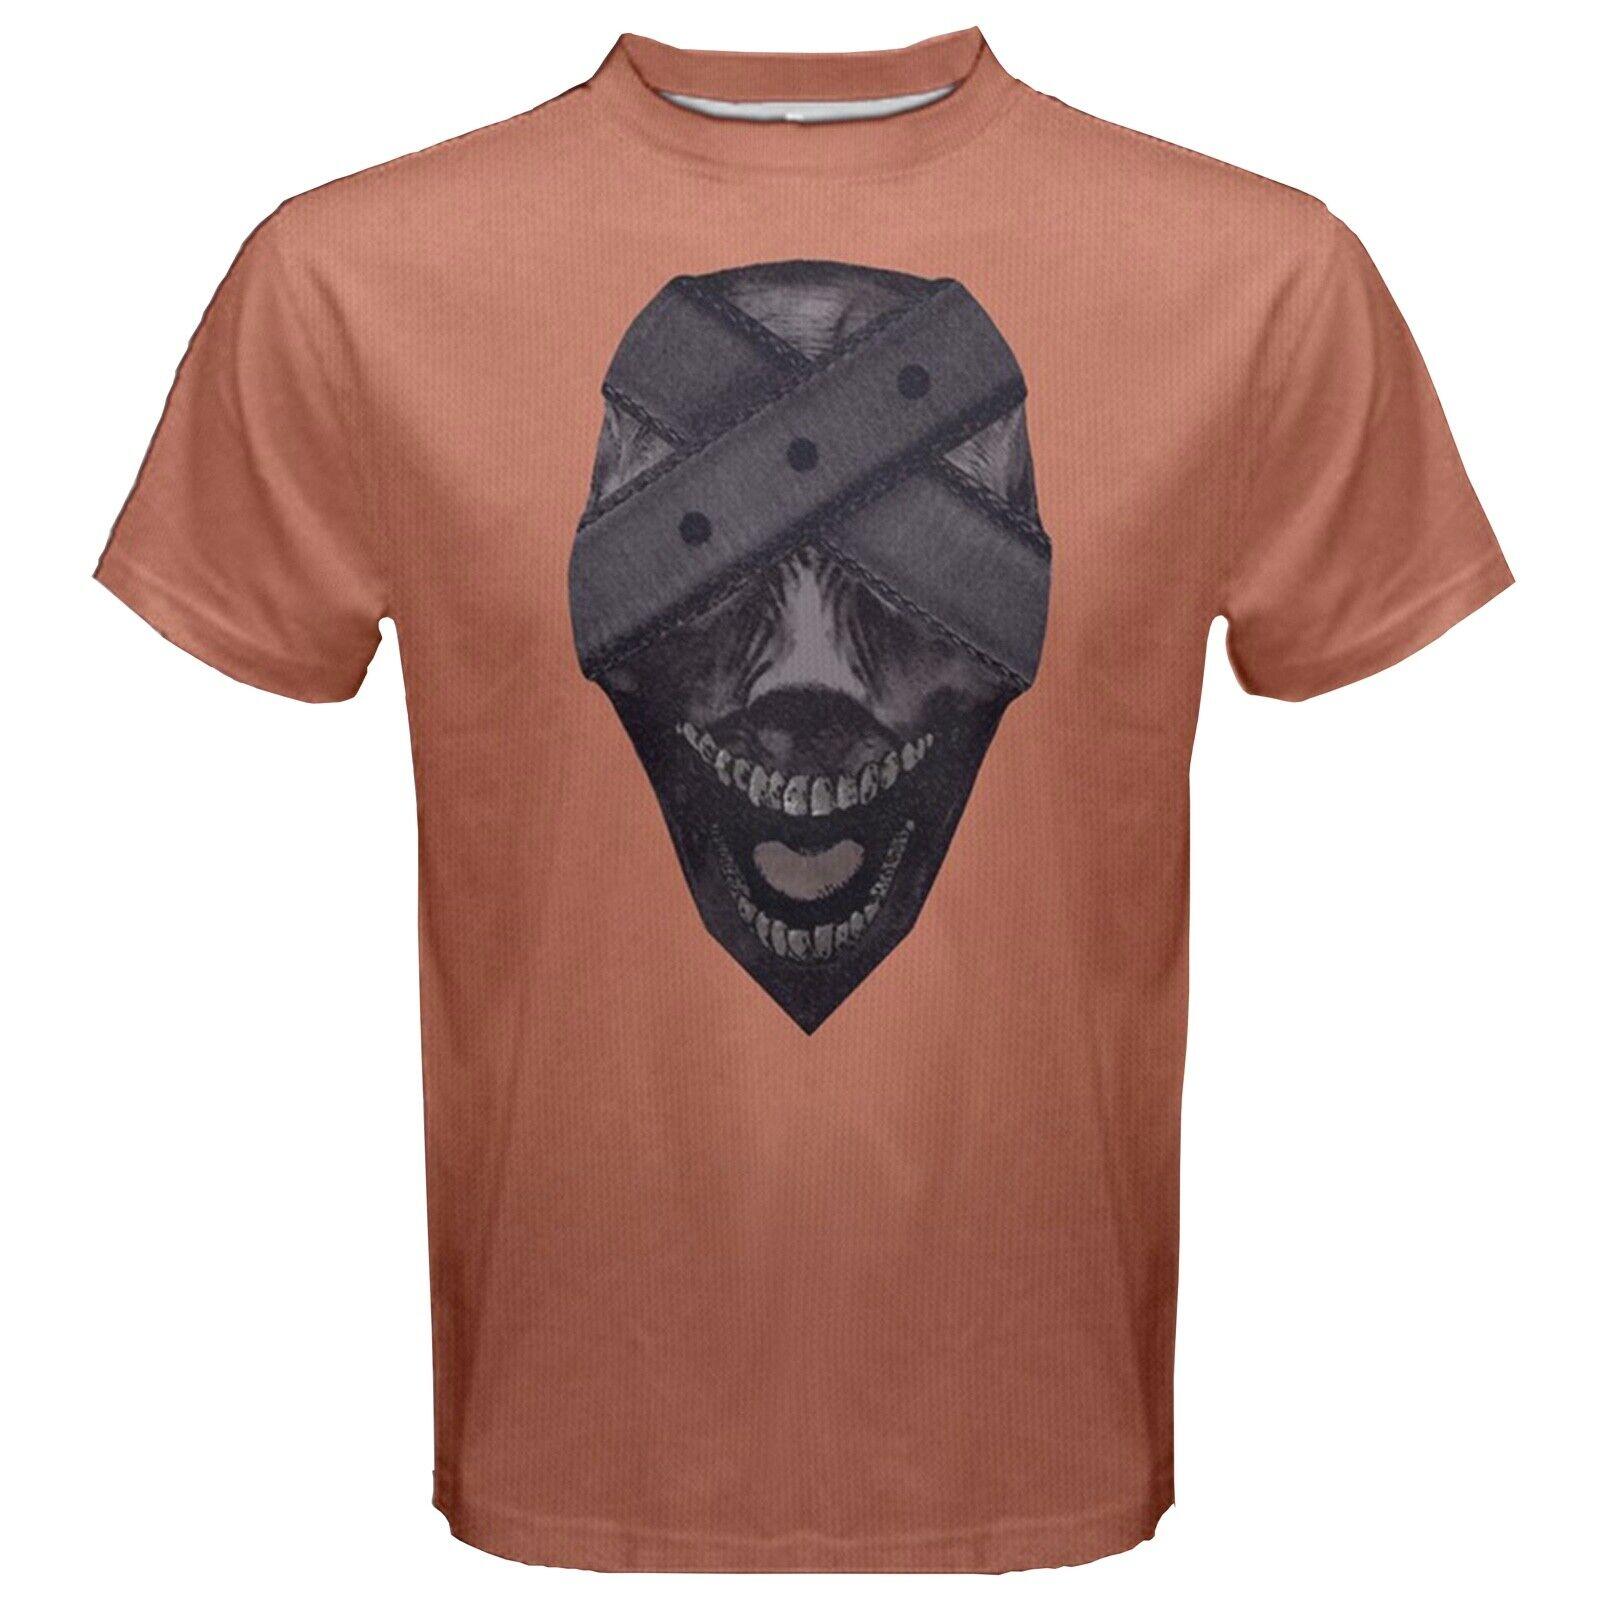 Fairy Tail Loke (Loki Locke) Casual Skull Outfit Cosplay T-Shirt